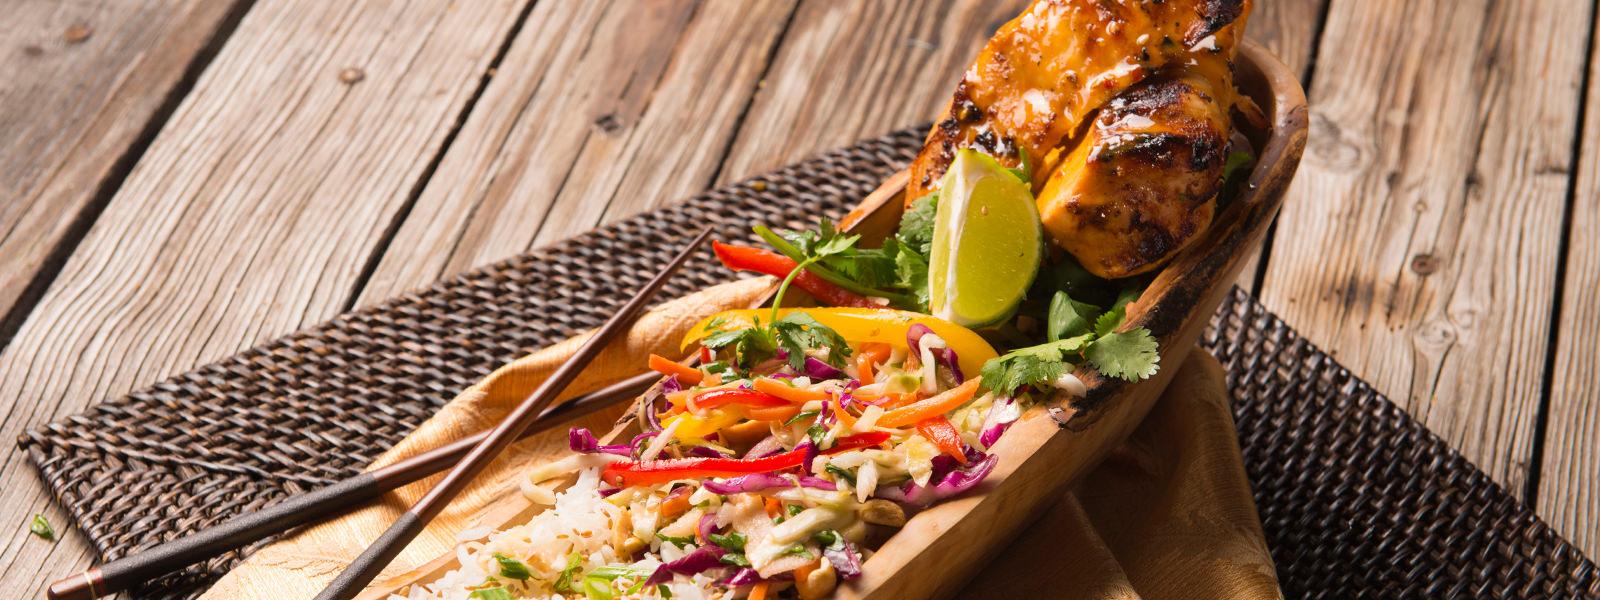 Malibu salad with smoked chicken: a recipe with photos 9